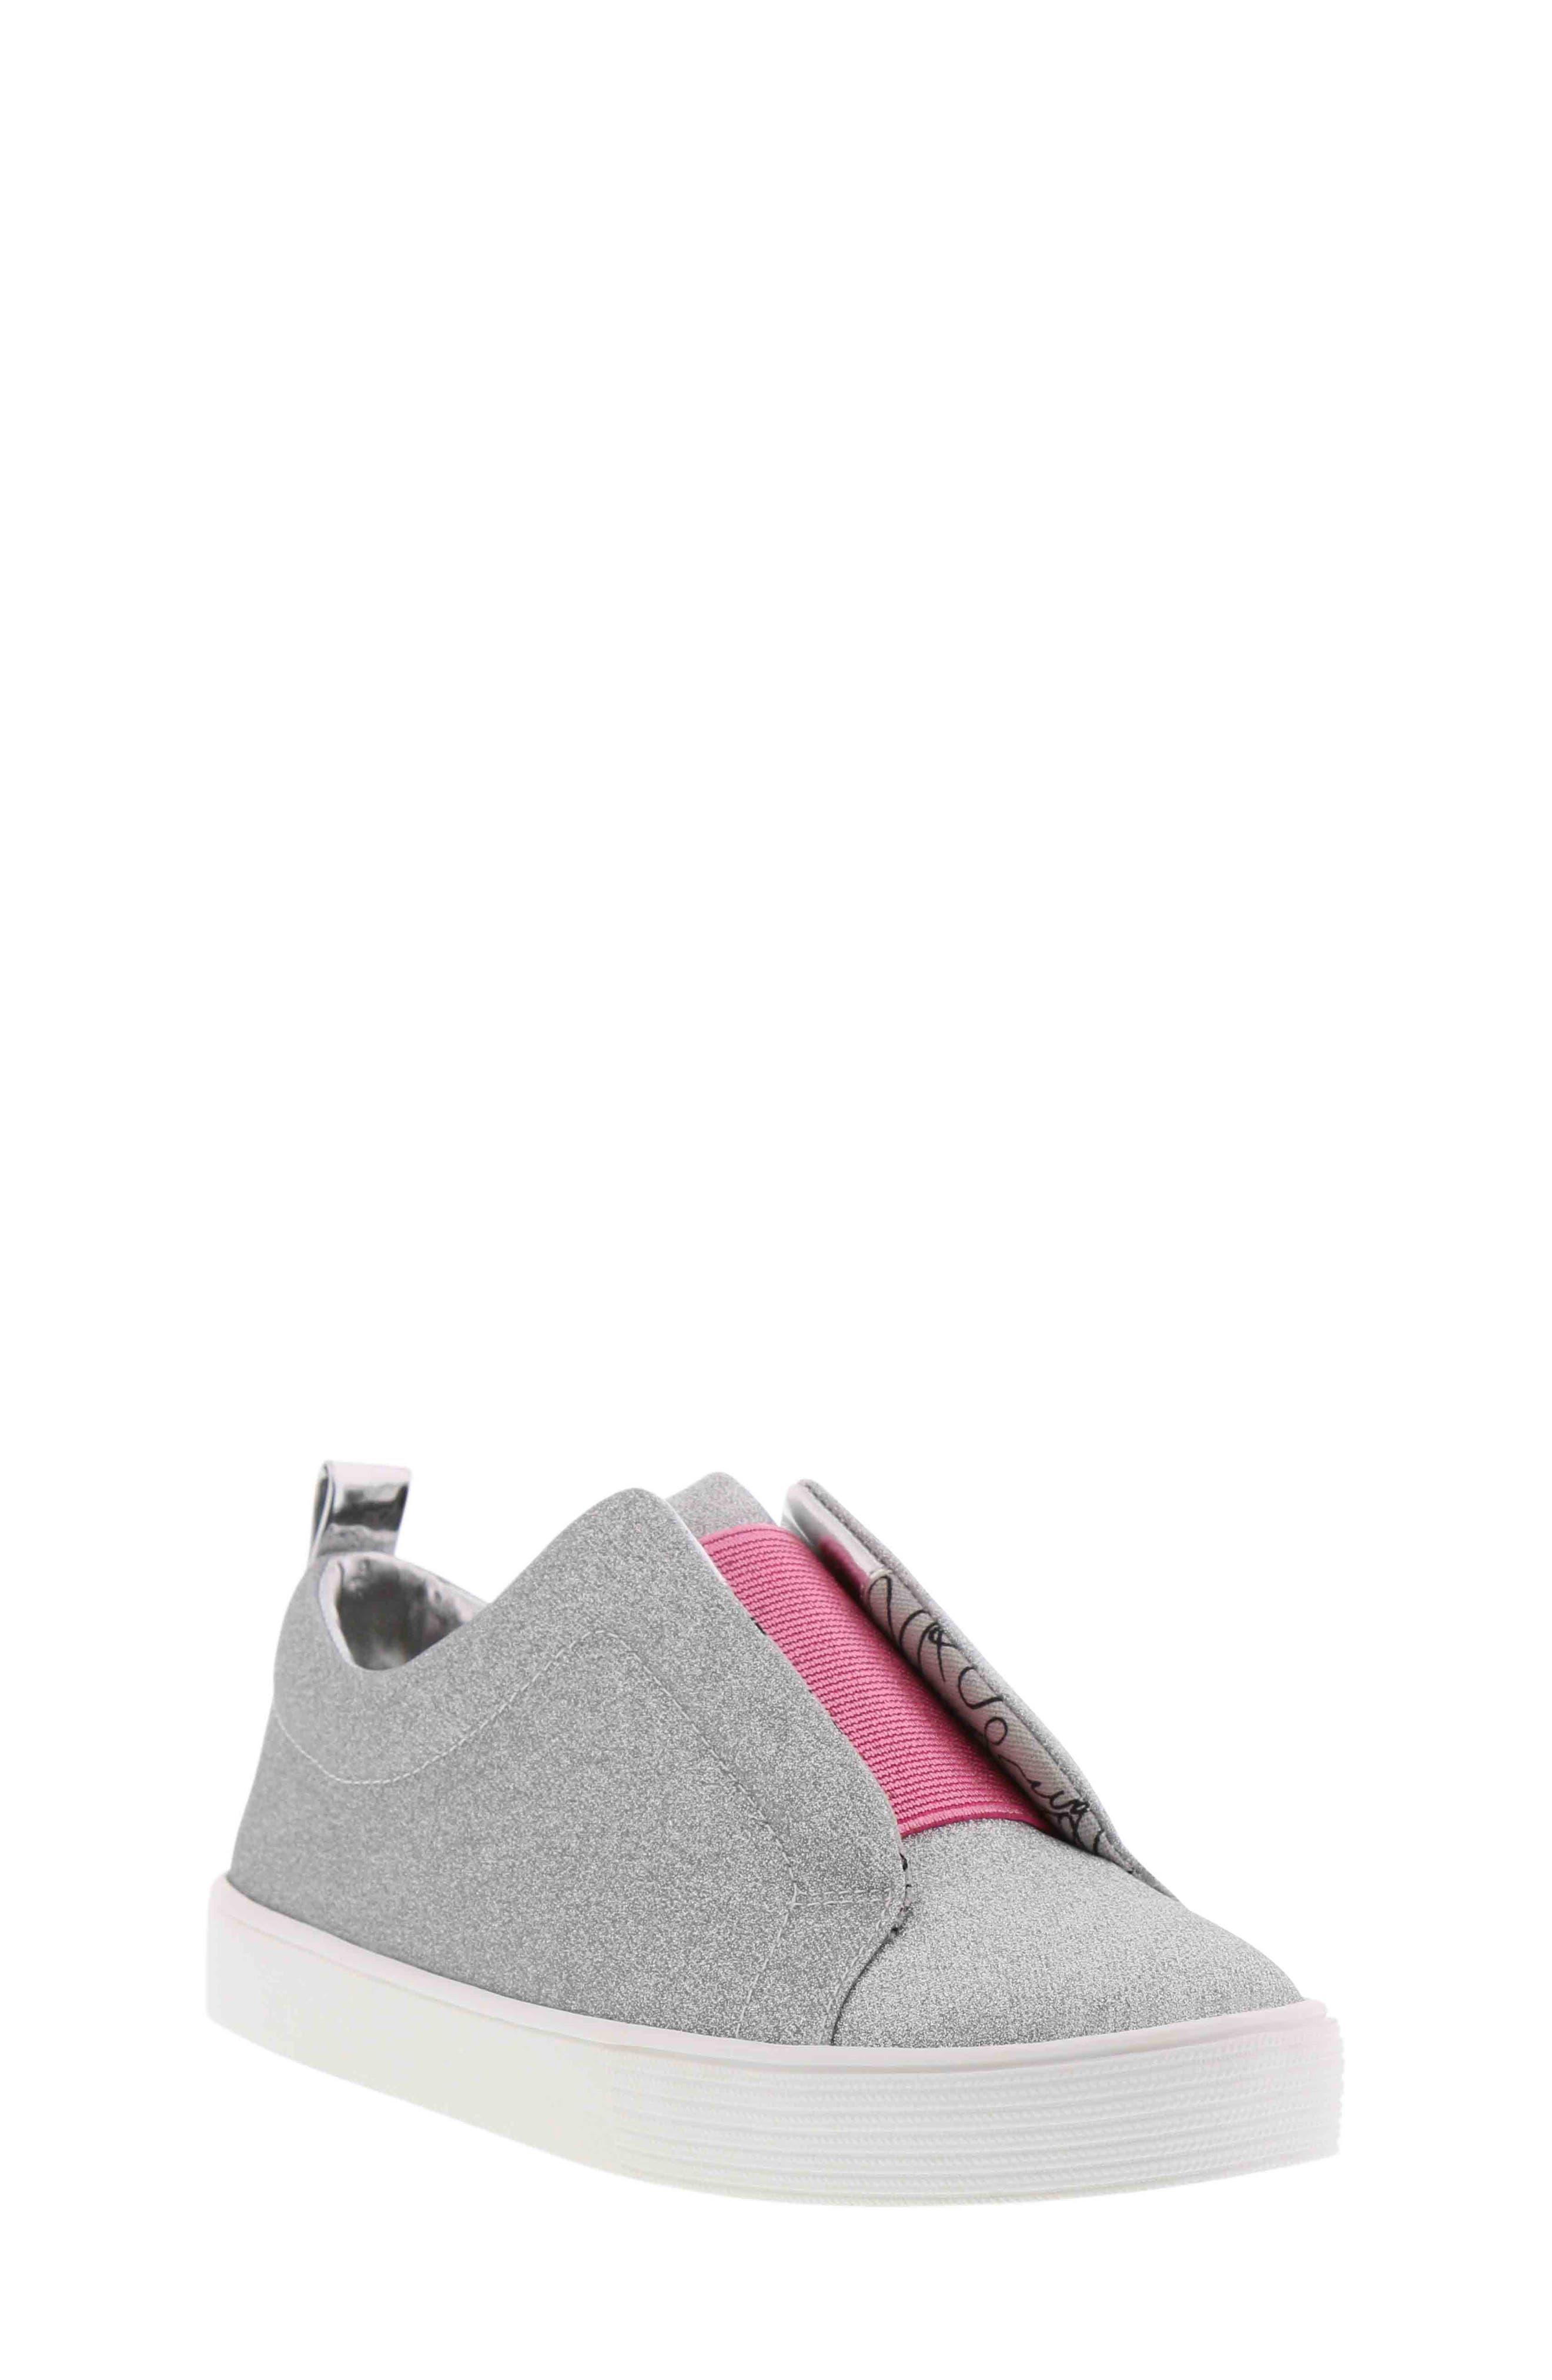 Bella Emma Slip-On Sneaker,                             Main thumbnail 1, color,                             SILVER GLITTER